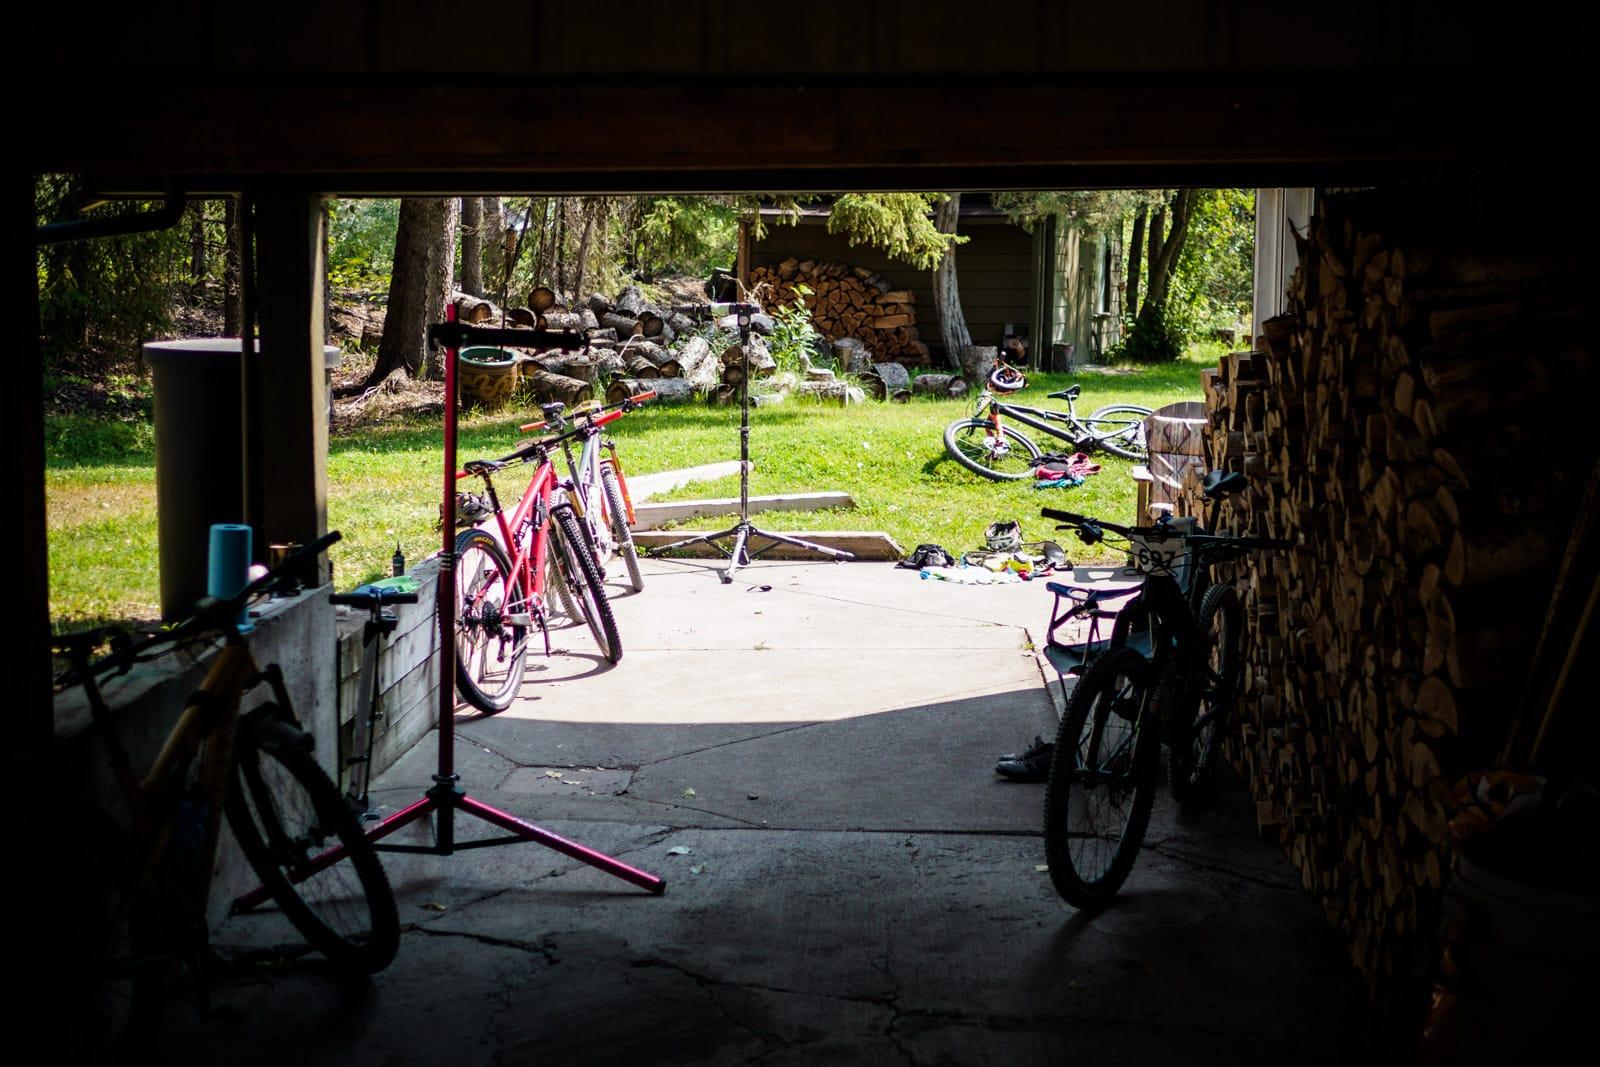 Santa Cruz Bicycles - Quiet Moments Between Stages at Singletrack6